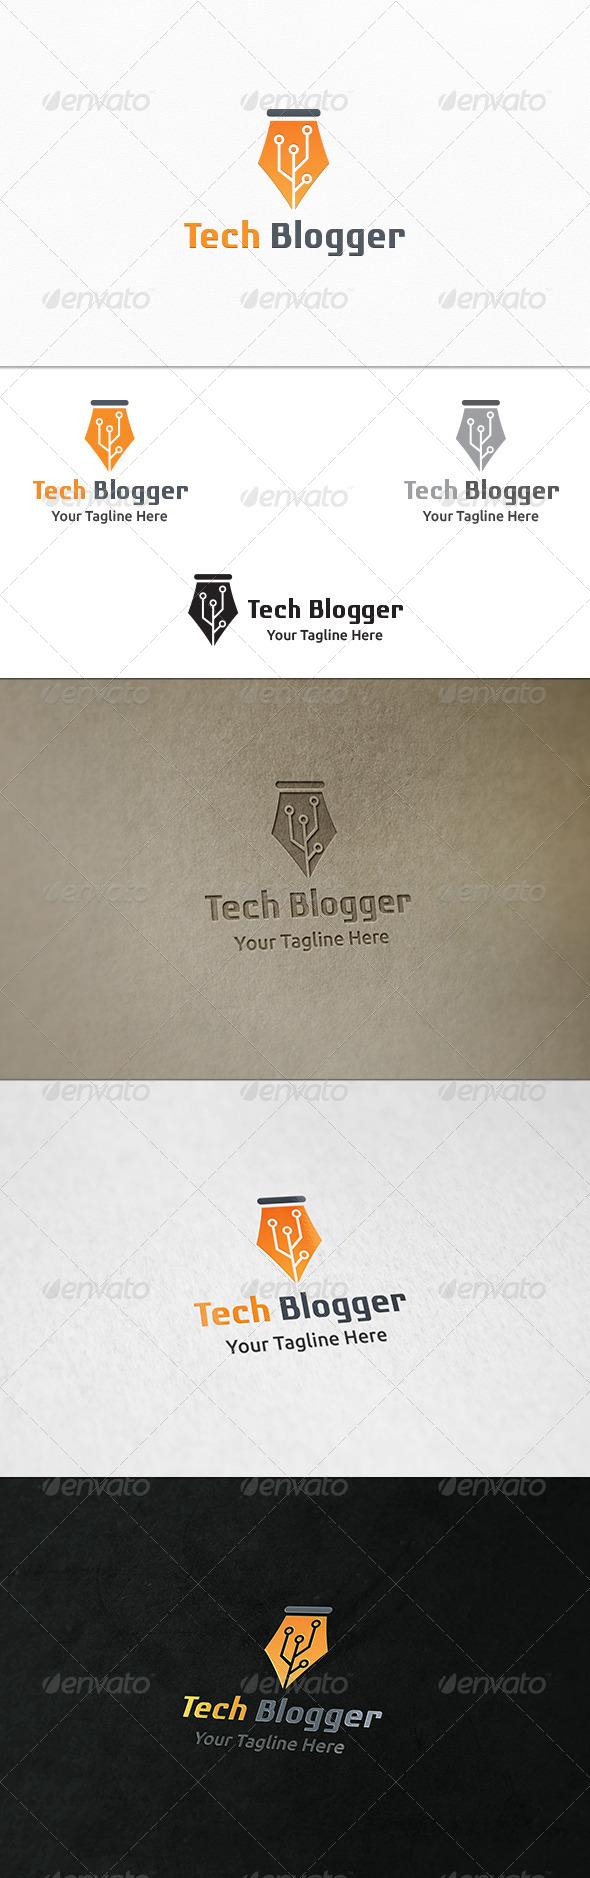 GraphicRiver Tech Blogger Logo Template 8282987